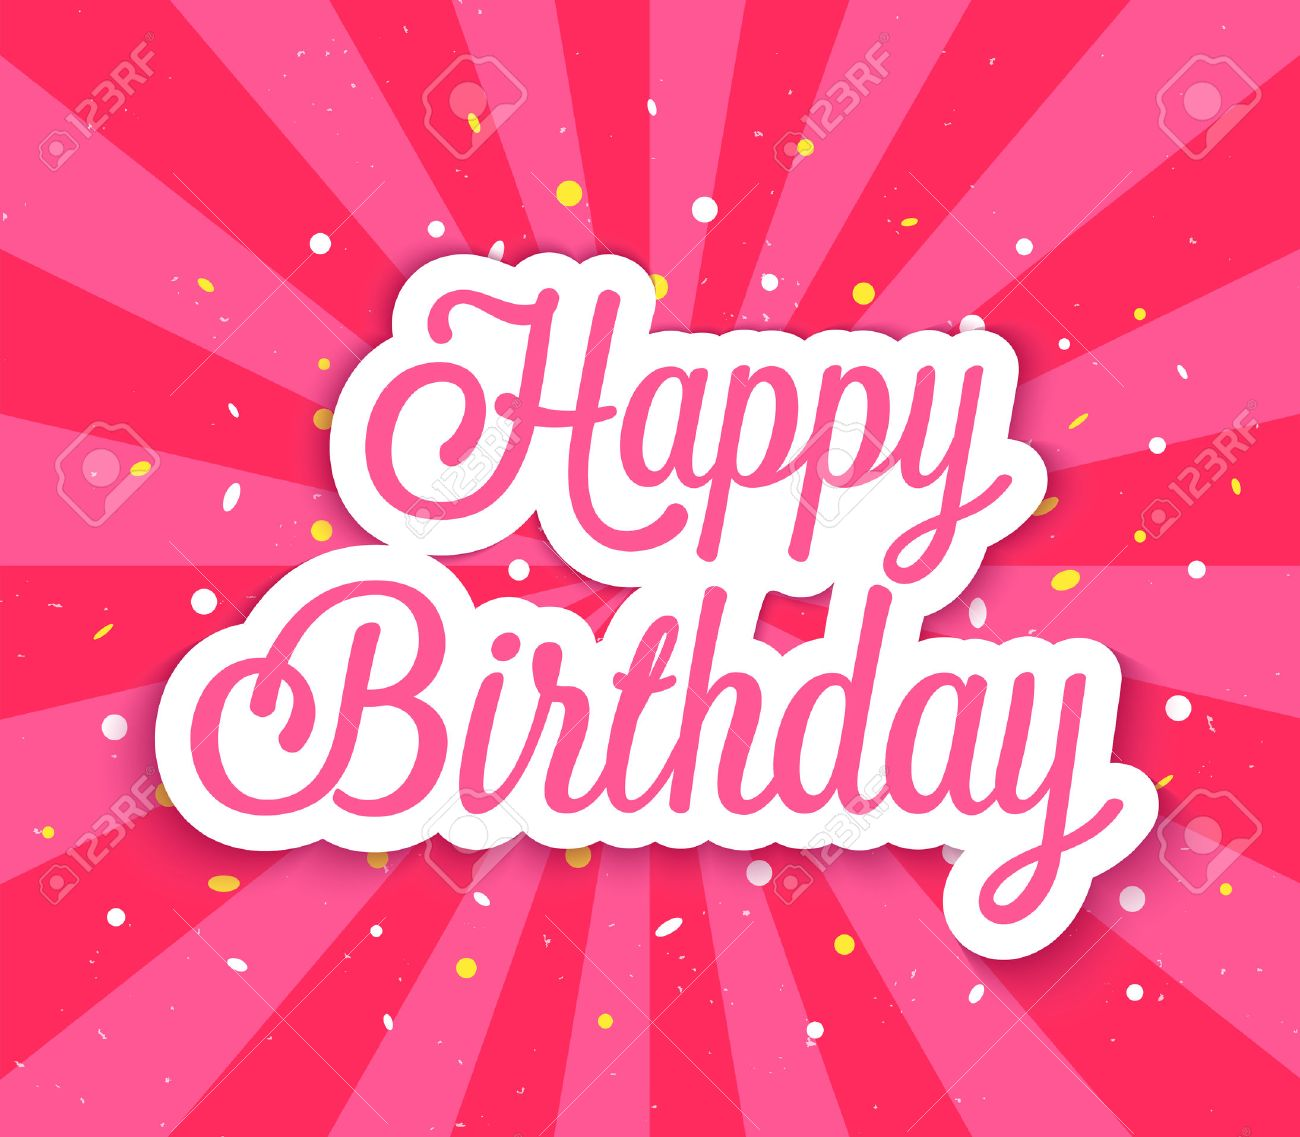 Happy Birthday Greeting Card Vector Illustration Royalty Free – Happy Birthday Greetings Photos